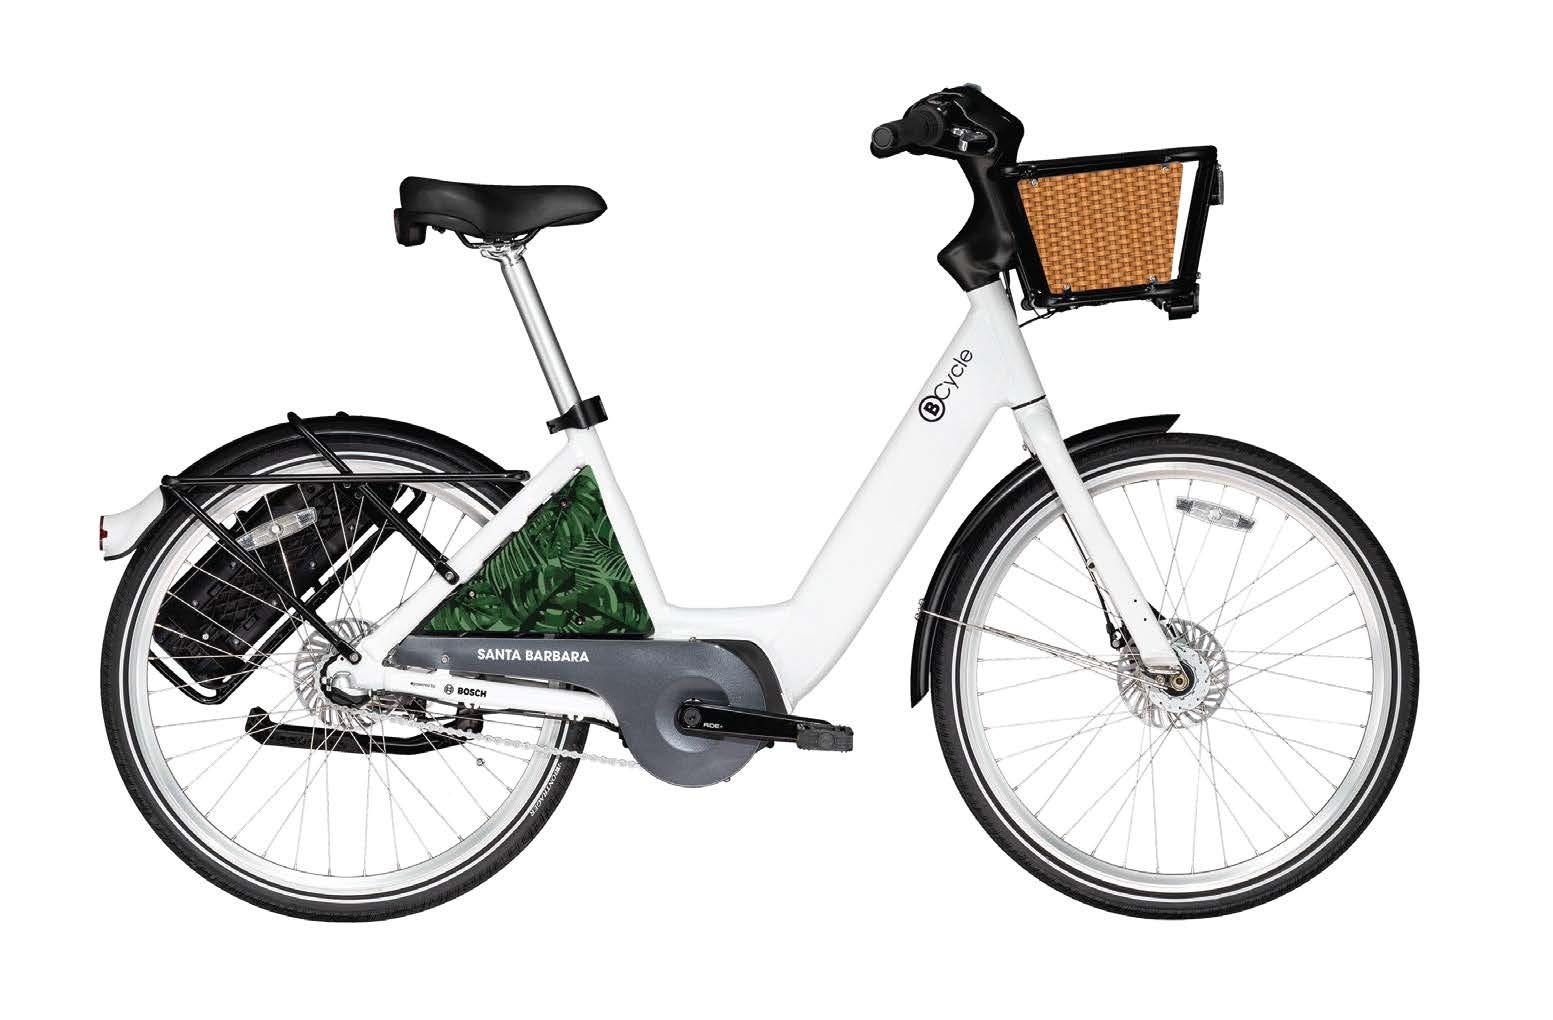 SB BCycle_Styleguide_v0 (2)_Bike Foliage